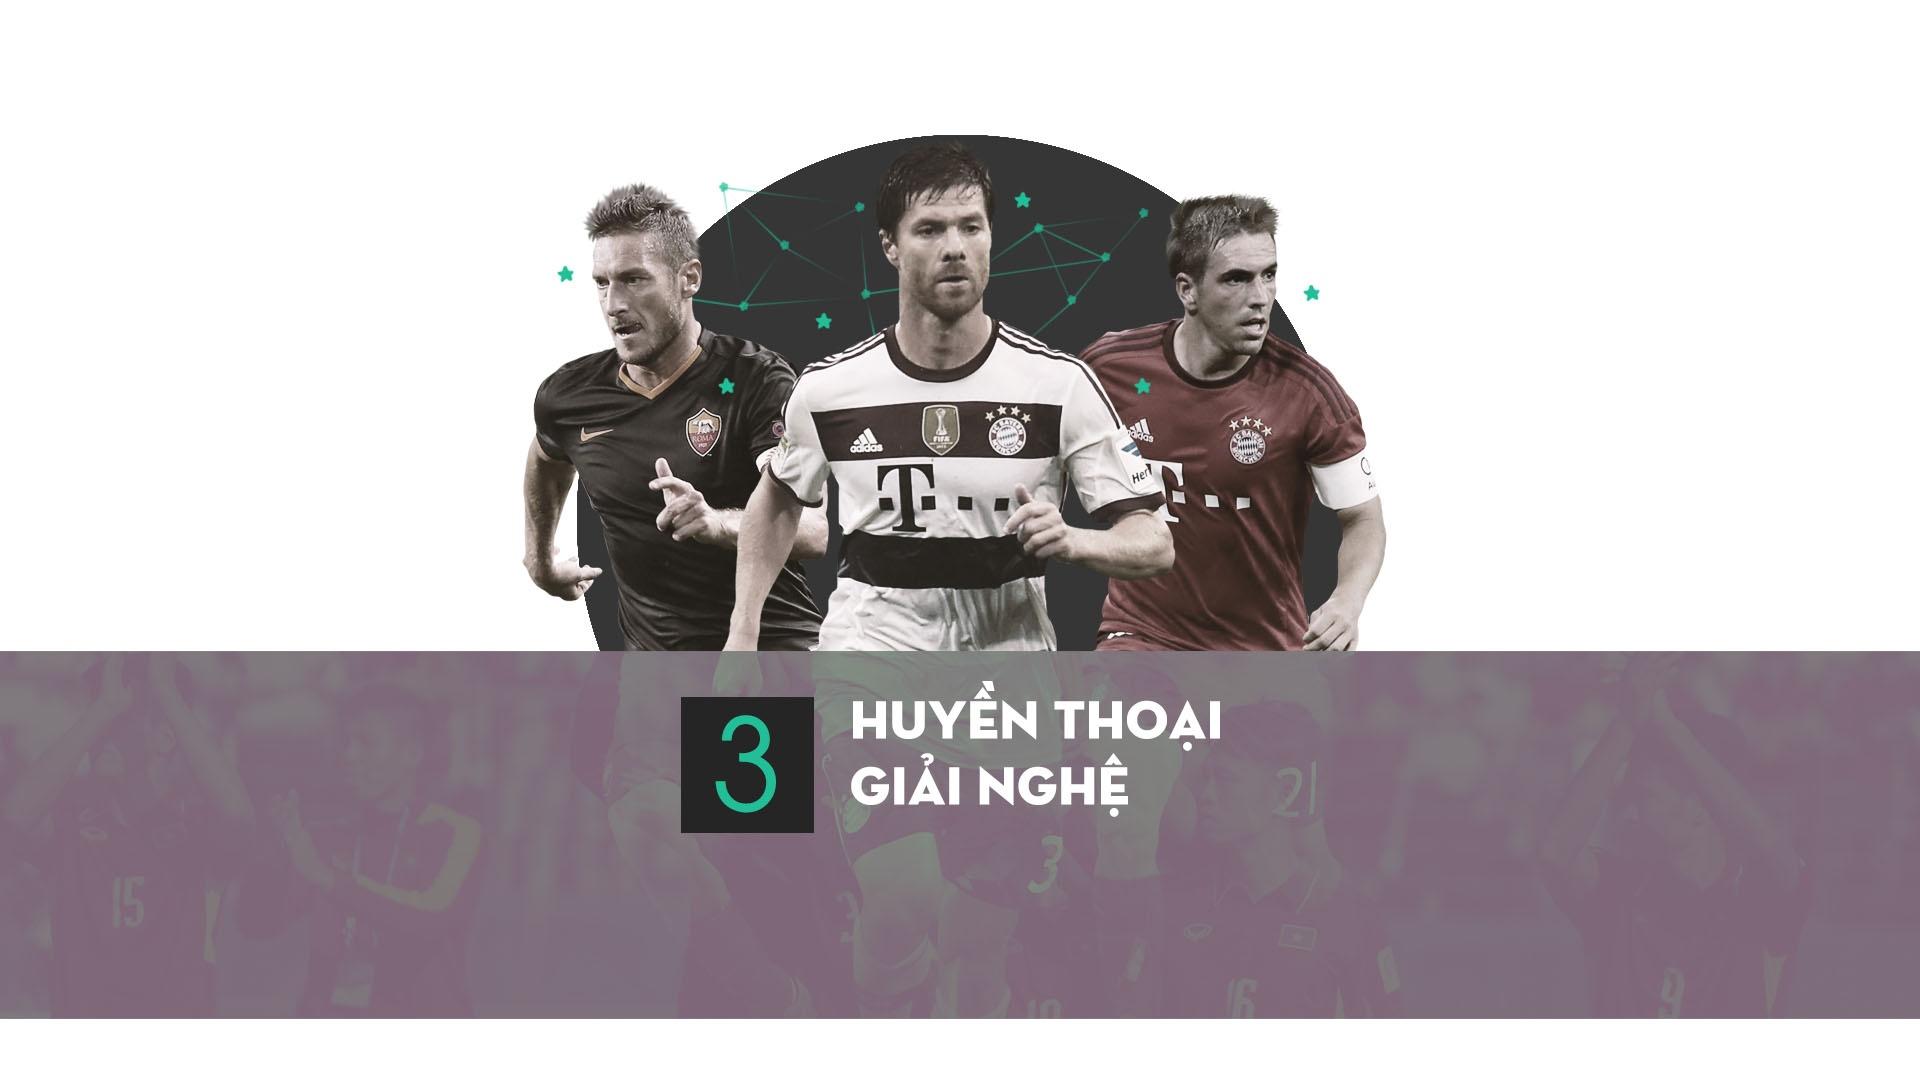 The thao the gioi 2017: Bom tan Neymar, CR7 va tran boxing bac ty hinh anh 10